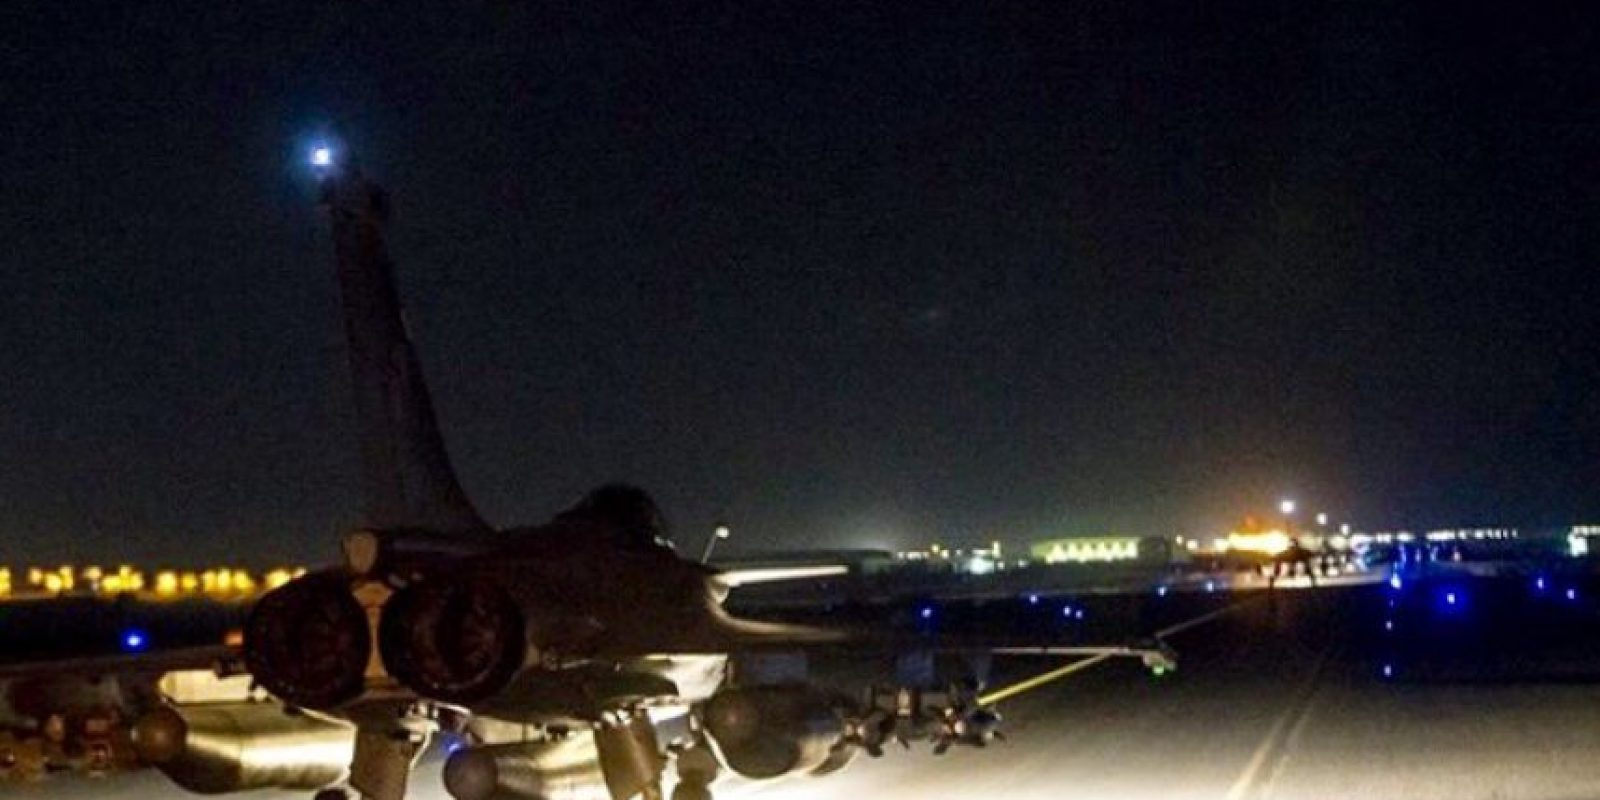 Hoy Francia bombardeó al Estado Islámico en Siria. Foto:Vía Twitter.com/Defense_gouv